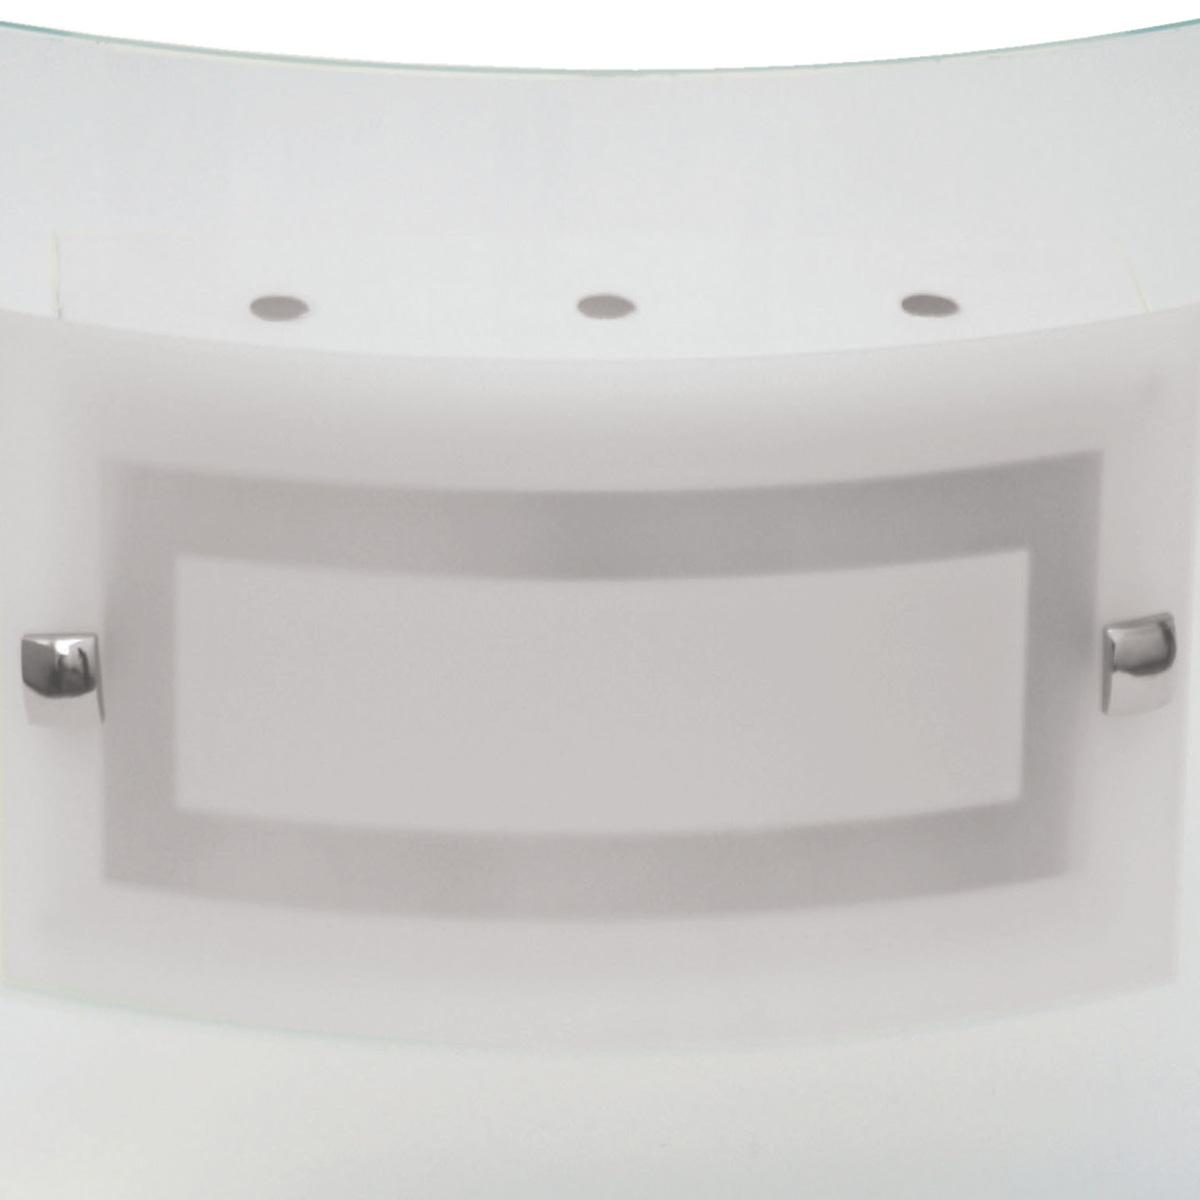 Plafon Artico 30x30cm Com Vidro Curvo Fosco E-27 2 Lamp. Max 60w